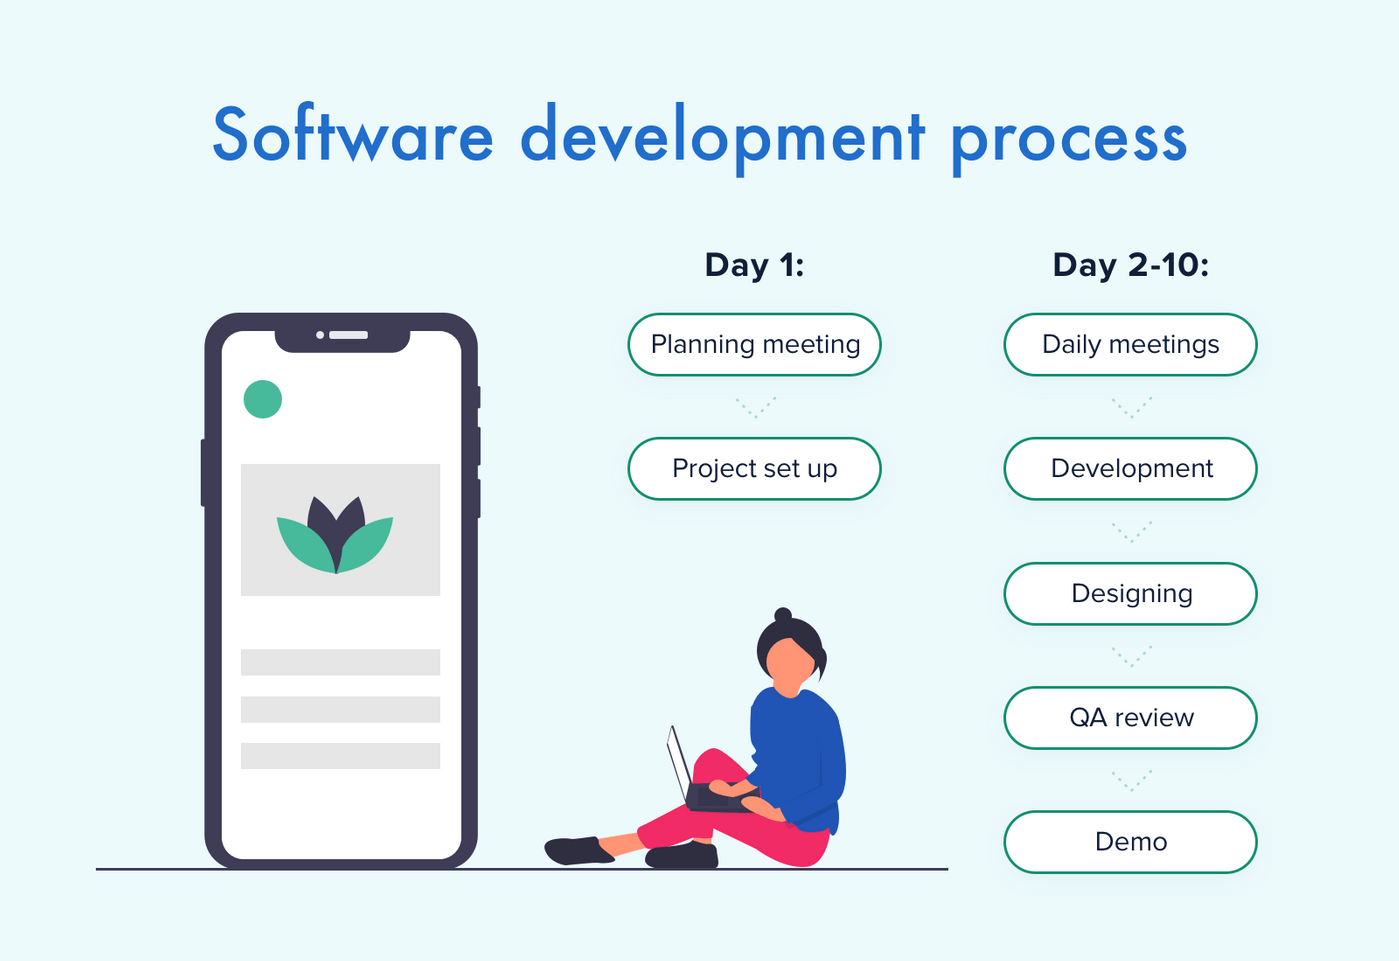 How software development process goes